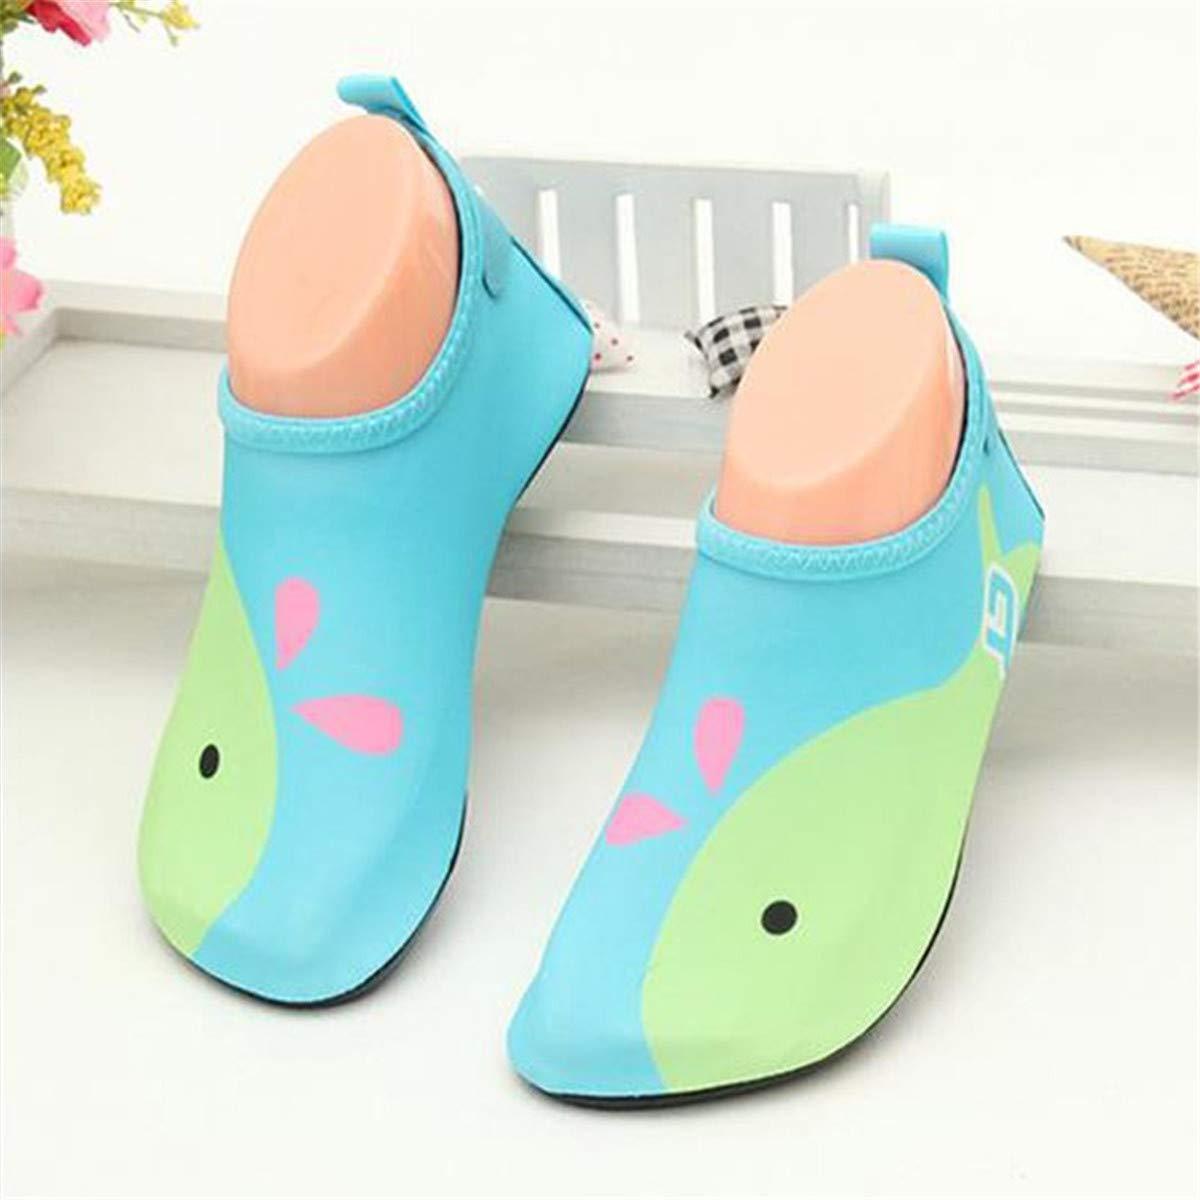 Toddler Kids Boys Girls Unicorn Swim Water Shoes Barefoot Aqua Socks Shoes Quick Dry Non-Slip Beach Pool Surfing Yoga Sports Shoes